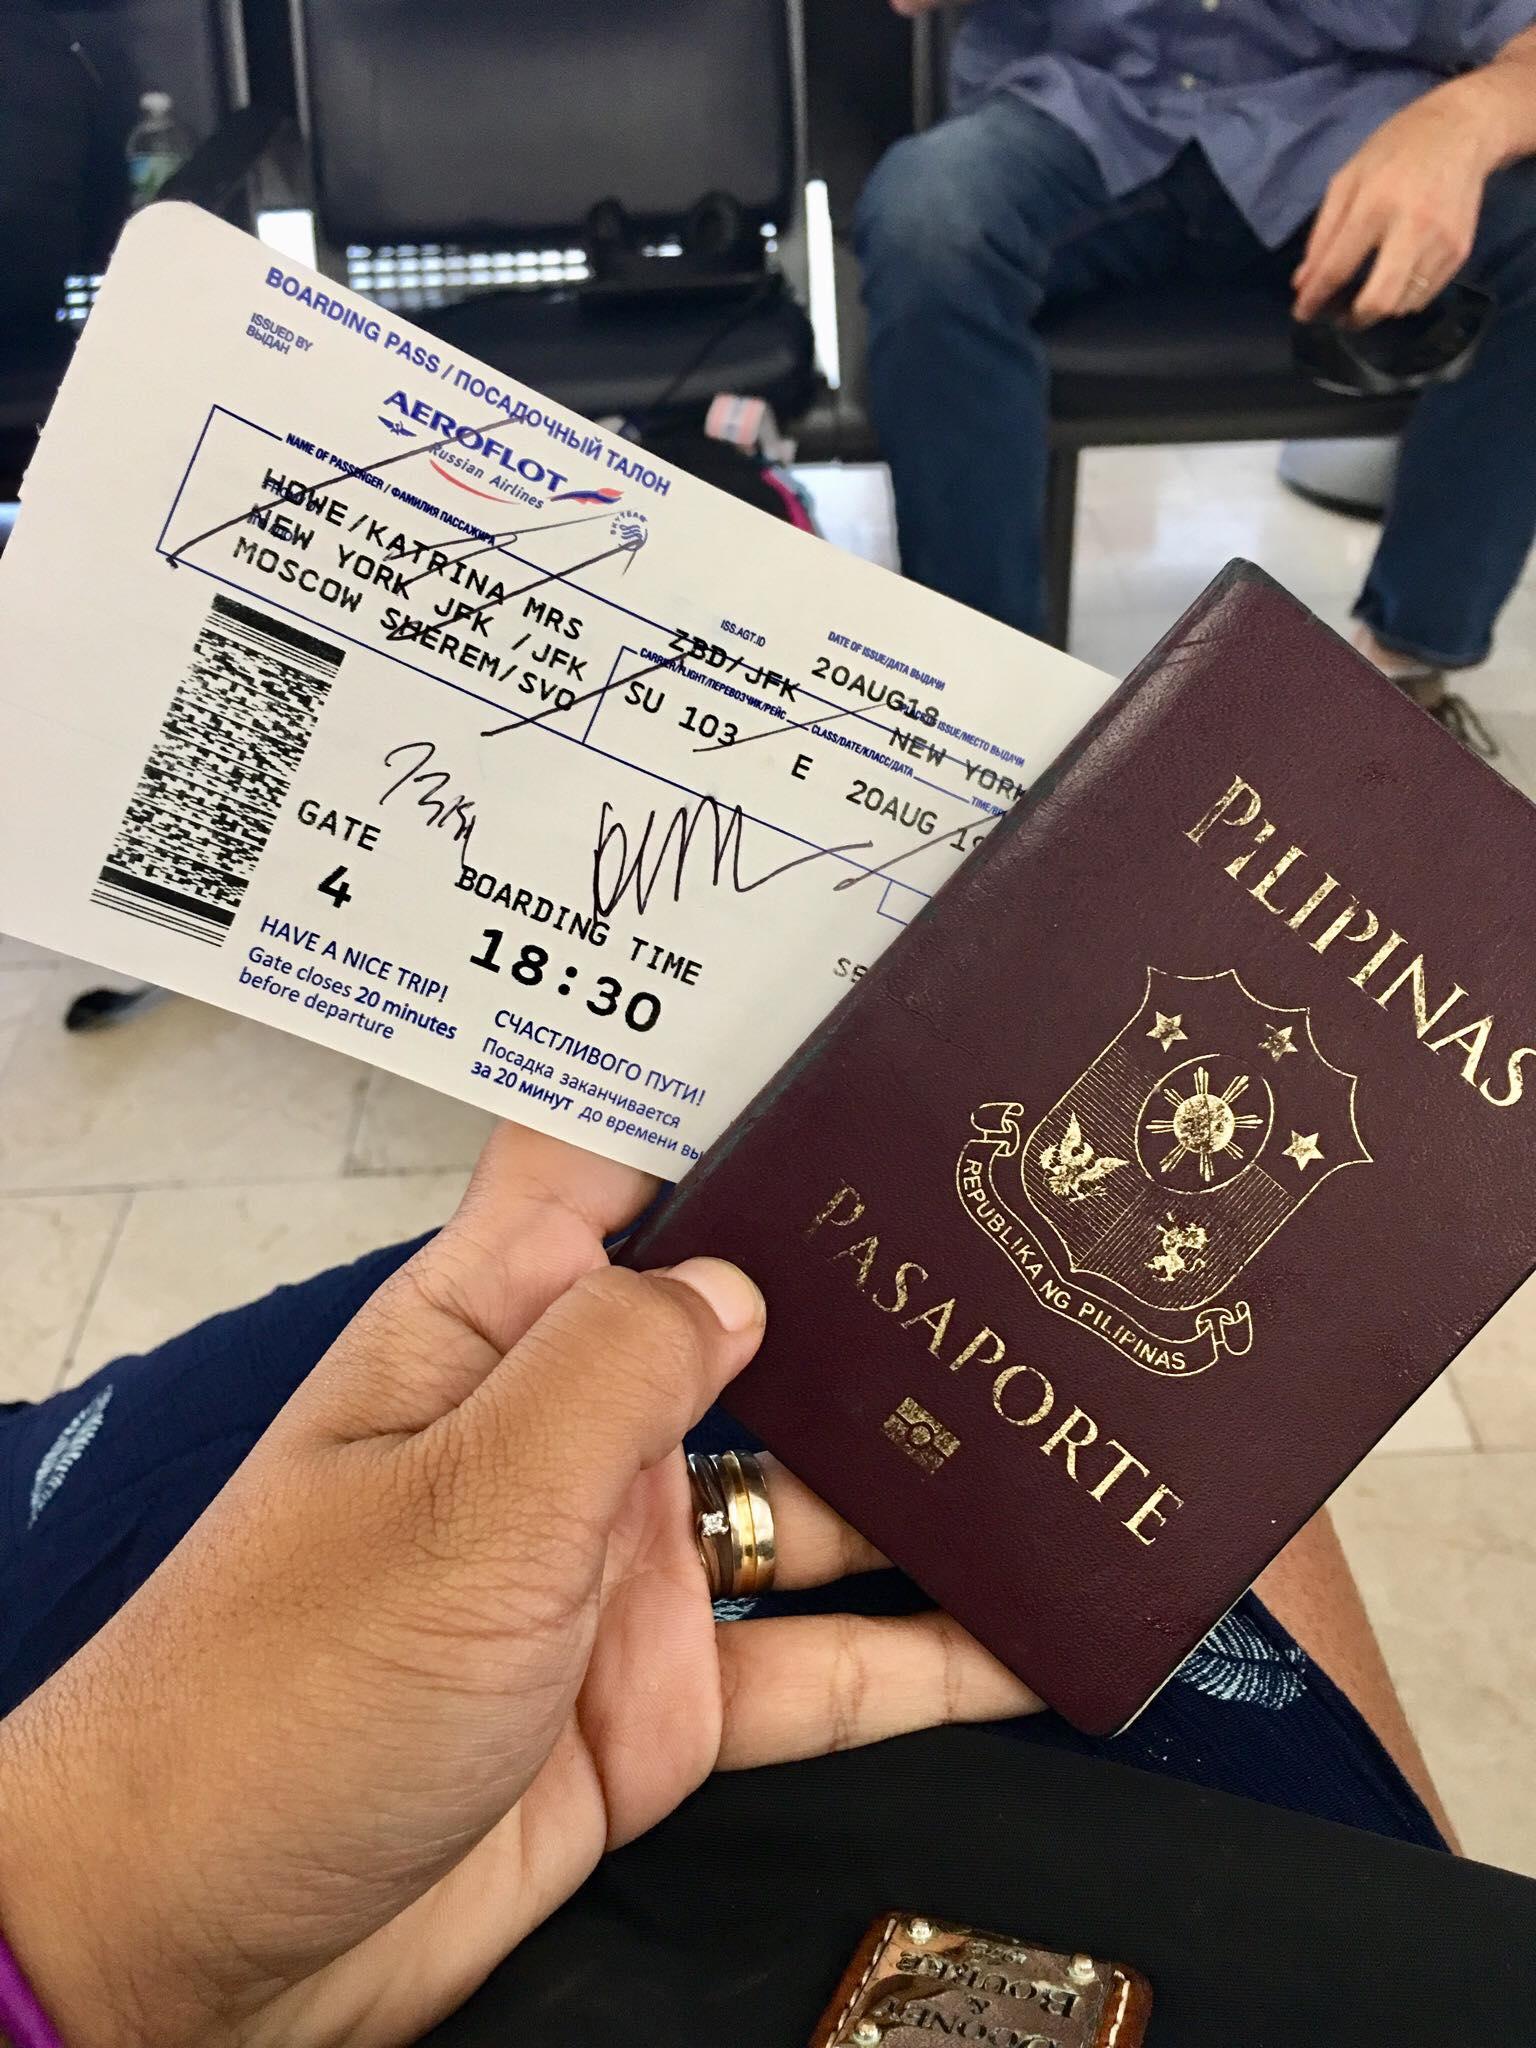 Kach Solo Travels Day 6: Arrived in Herceg Novi, Montenegro